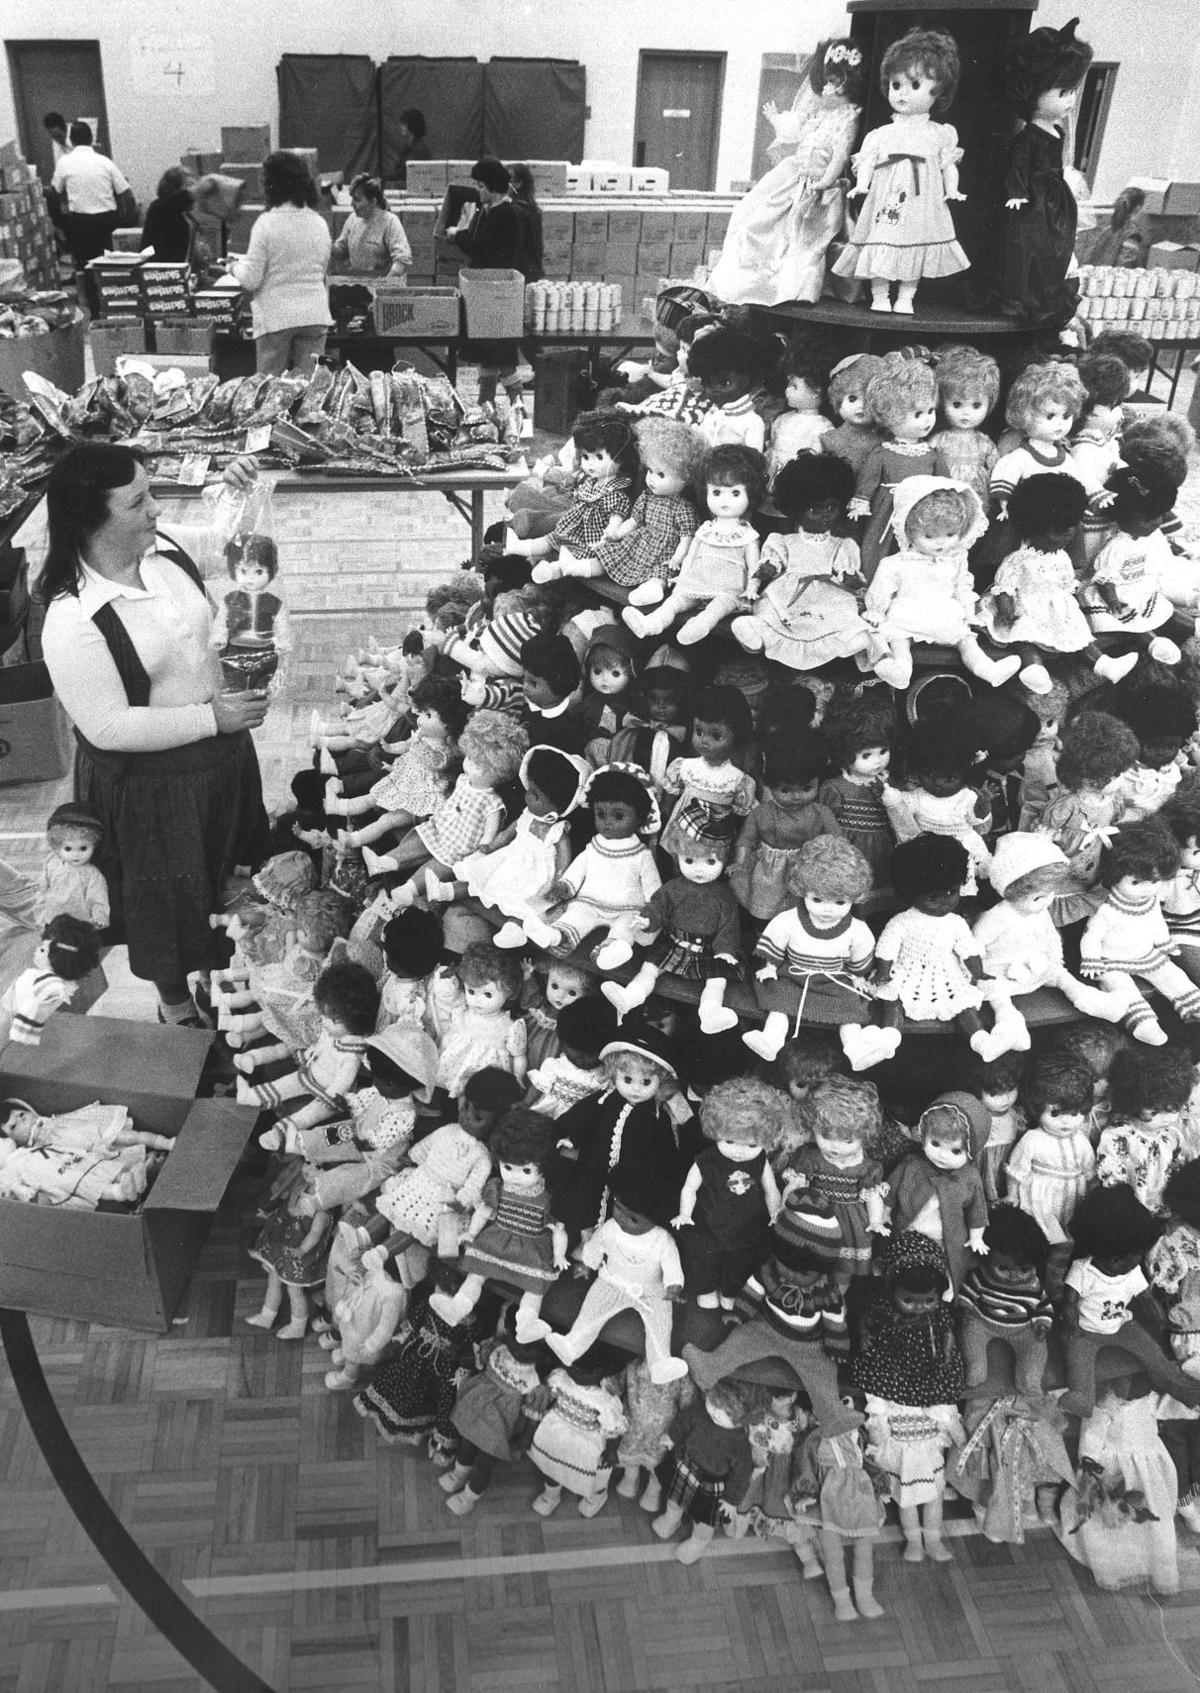 Salvation Army's annual Christmas Cheer Program